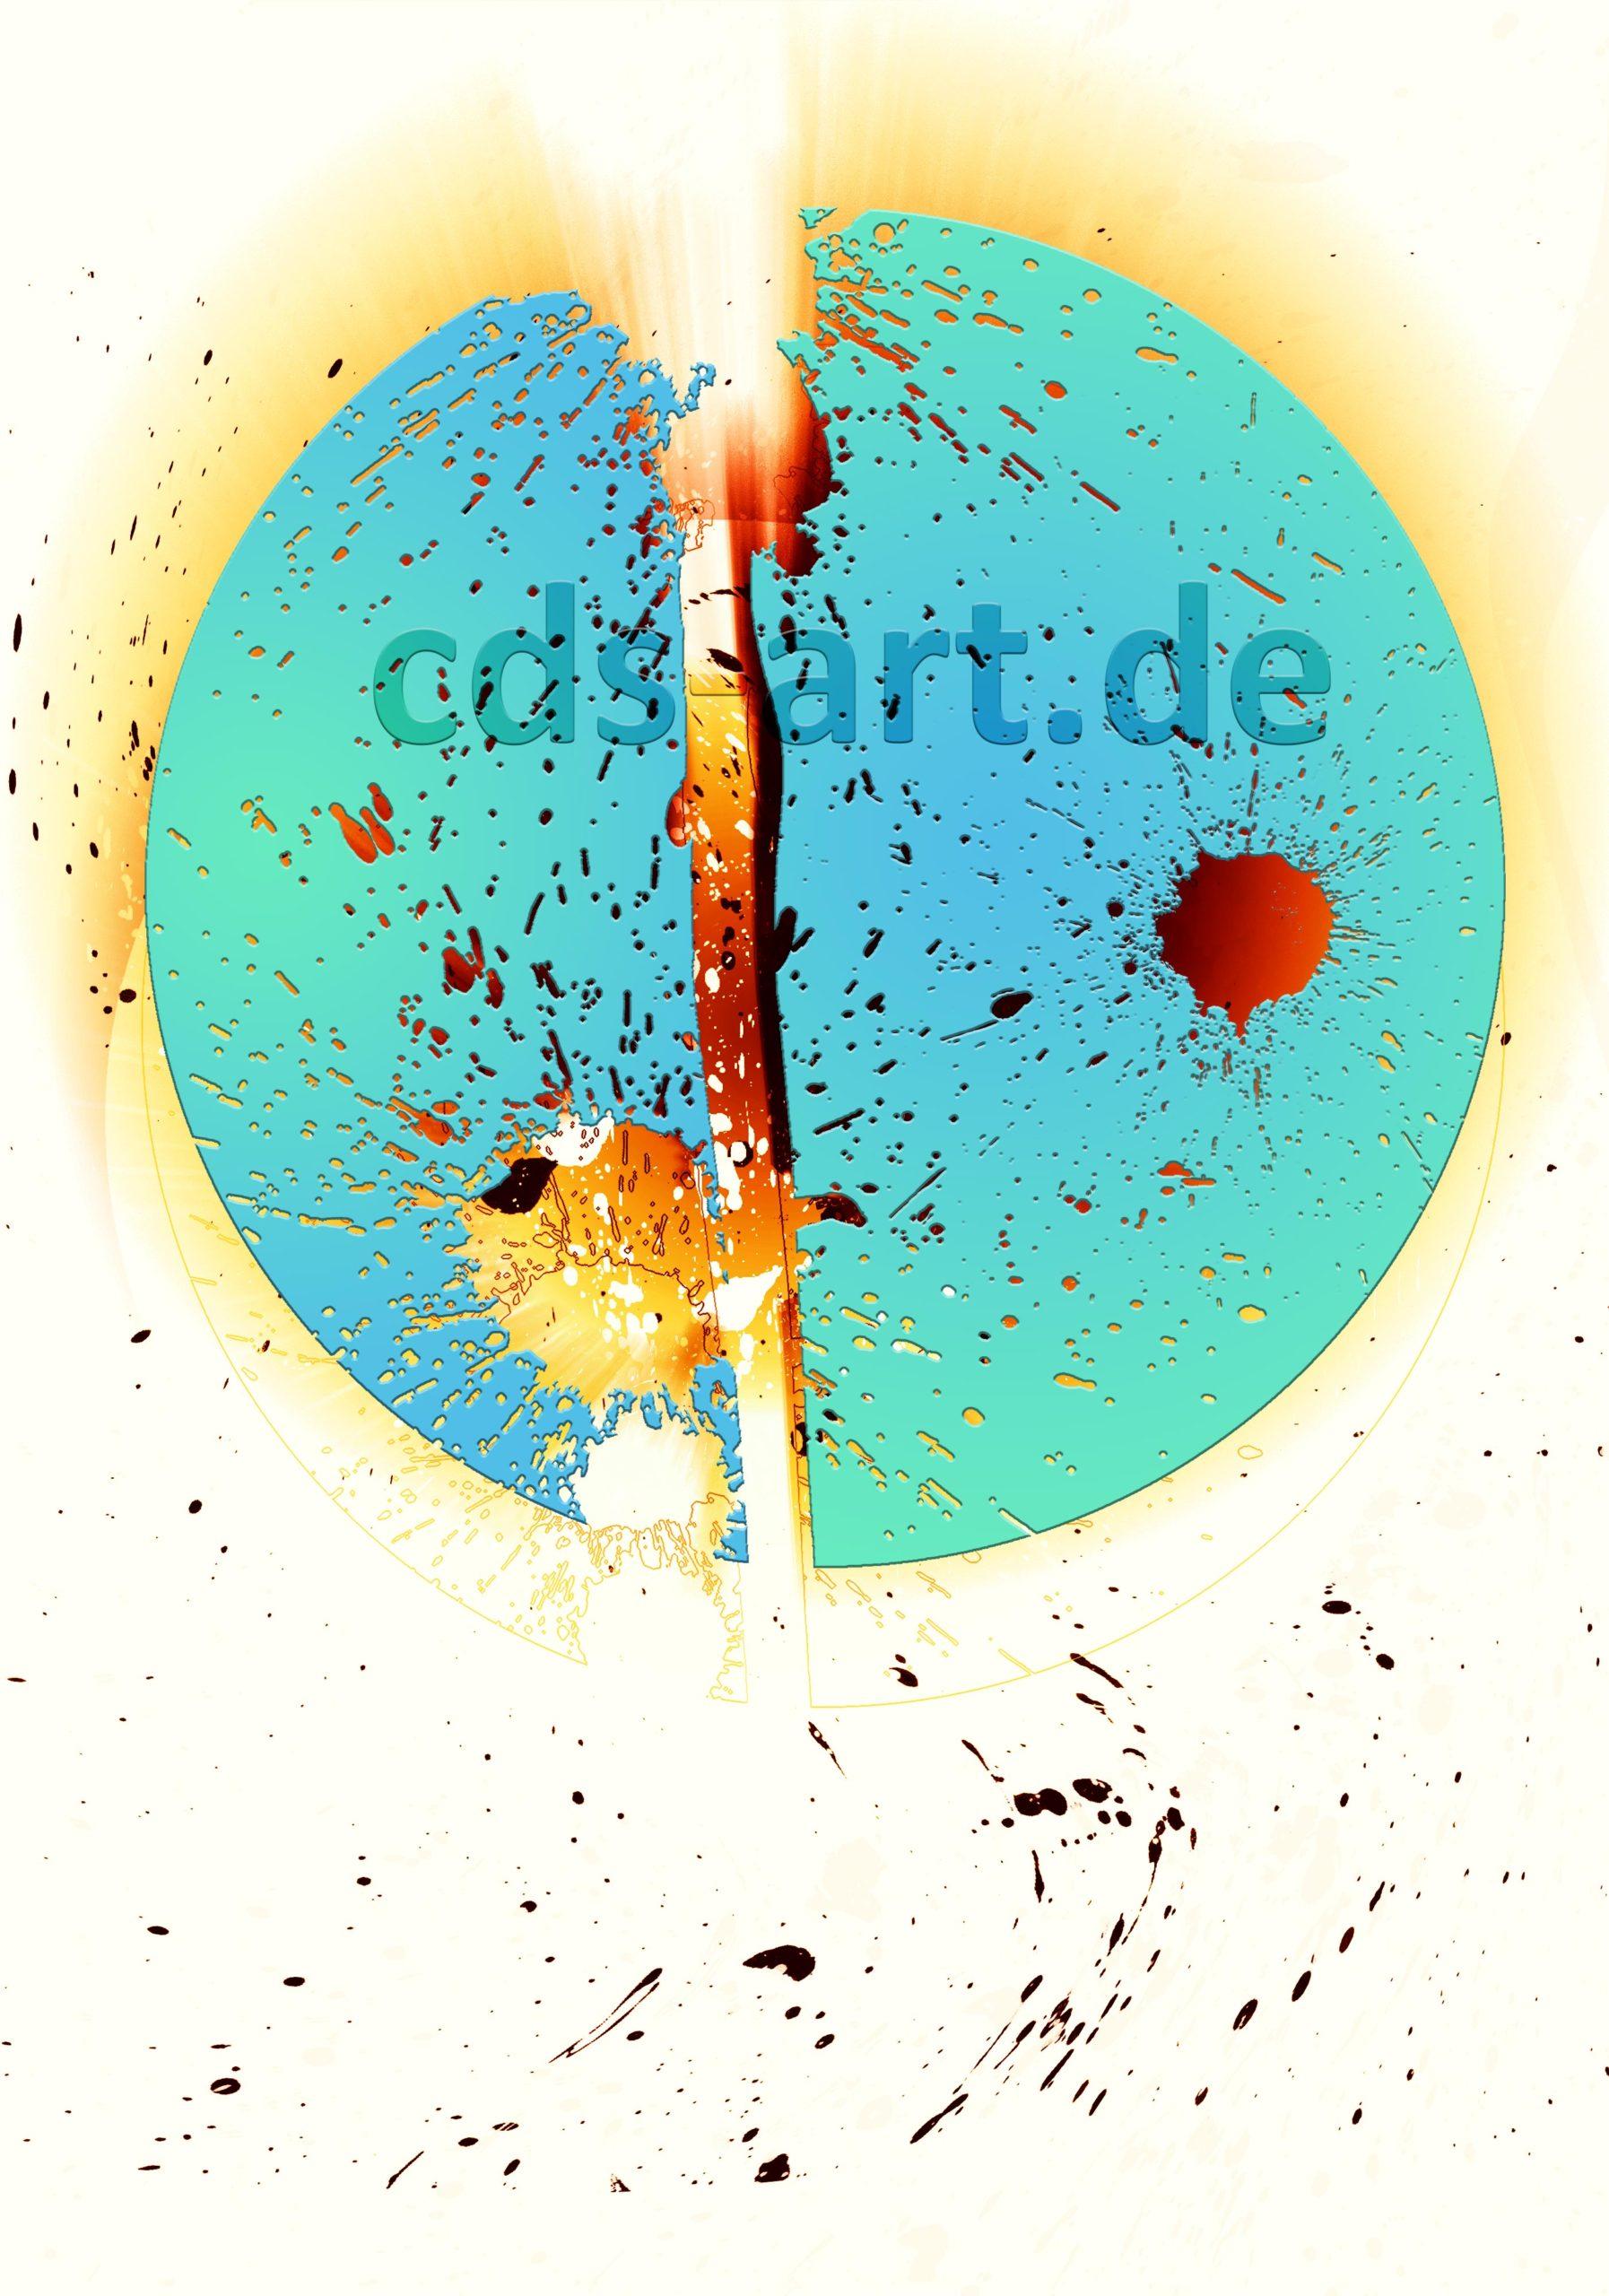 Planet explode 2